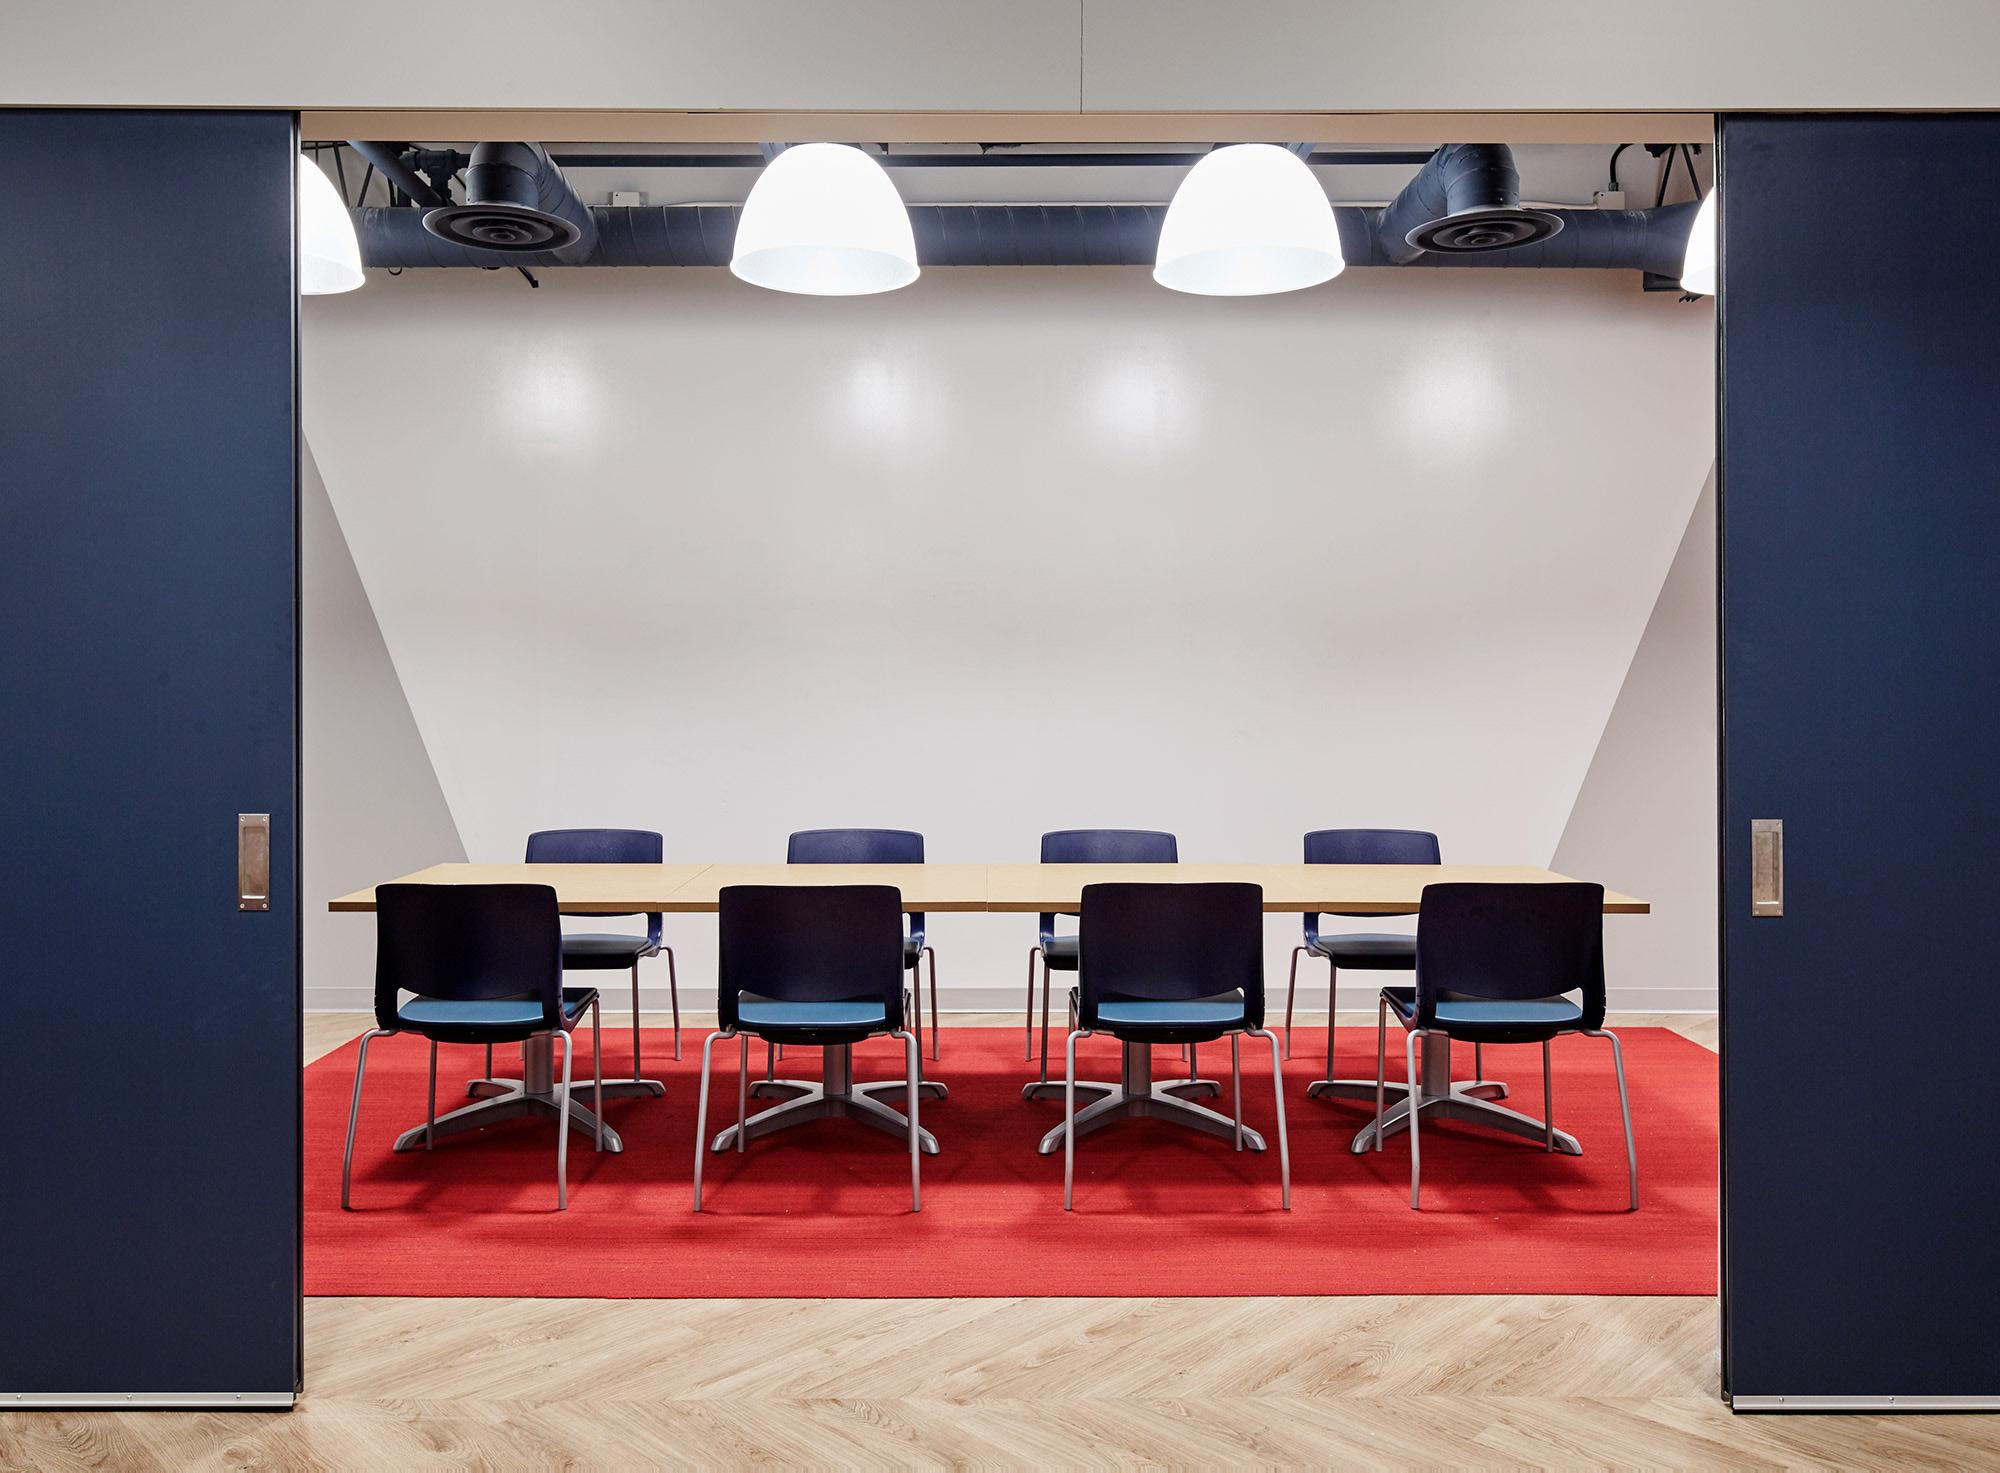 halifax-interior-design-tech-office-conference-room.jpg